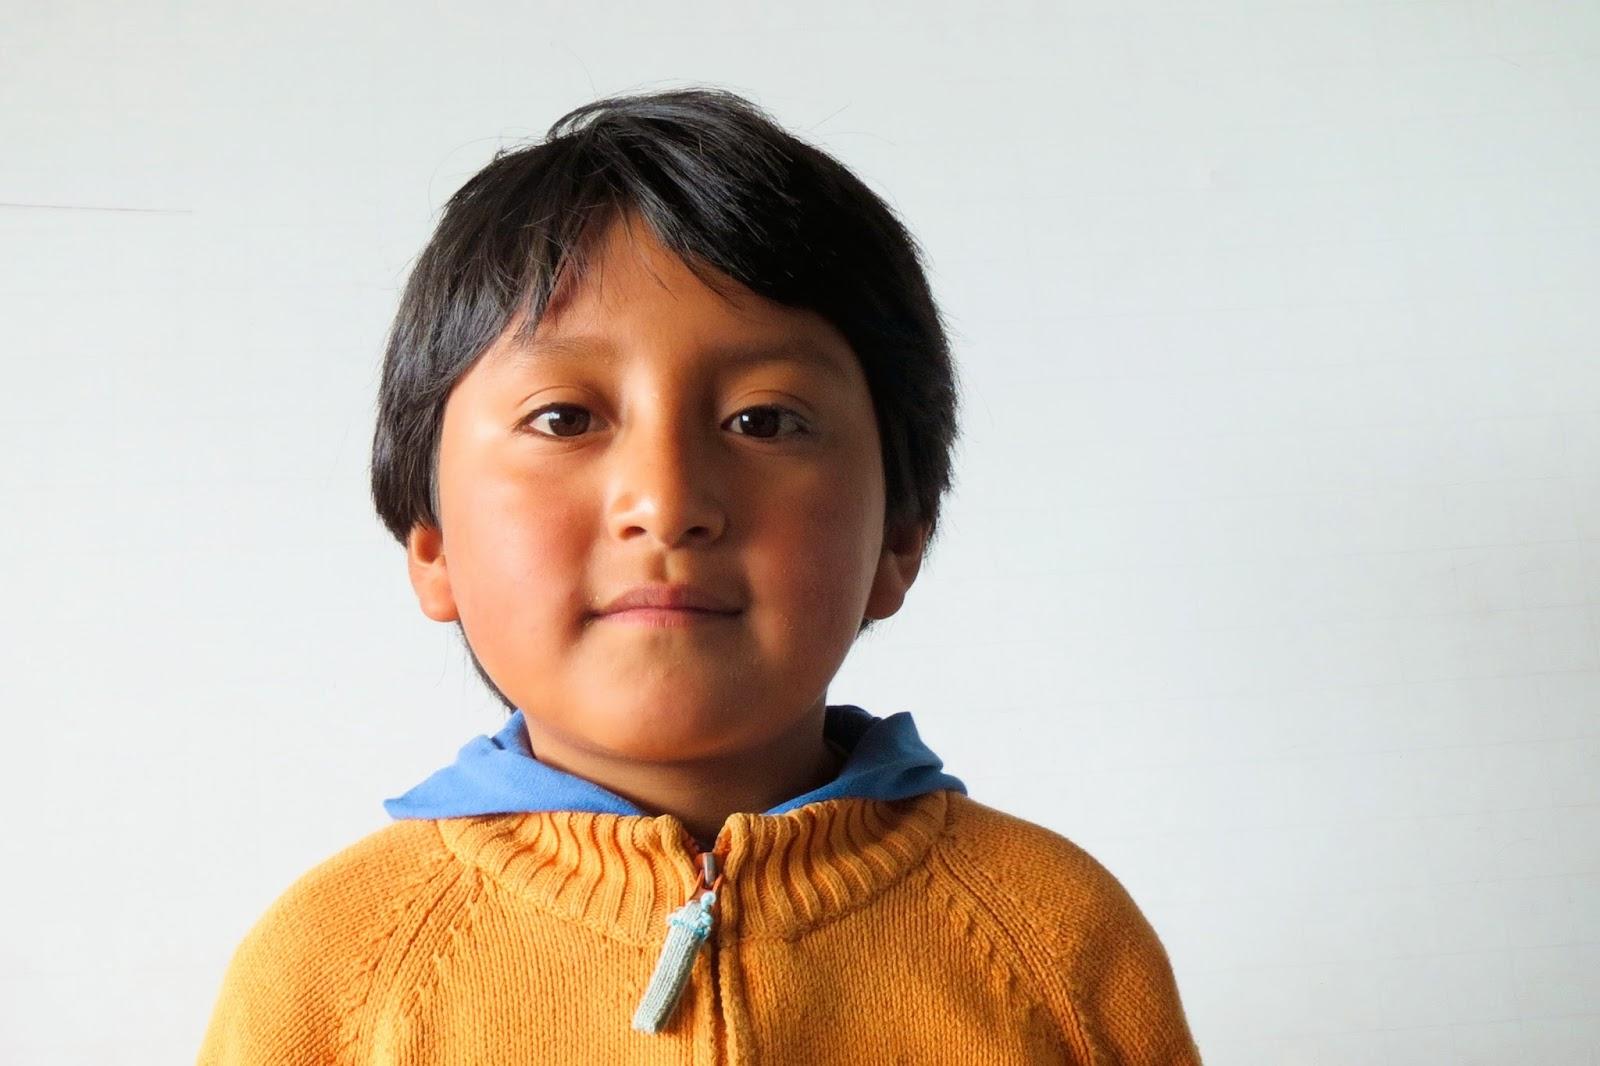 Malko, Age 7